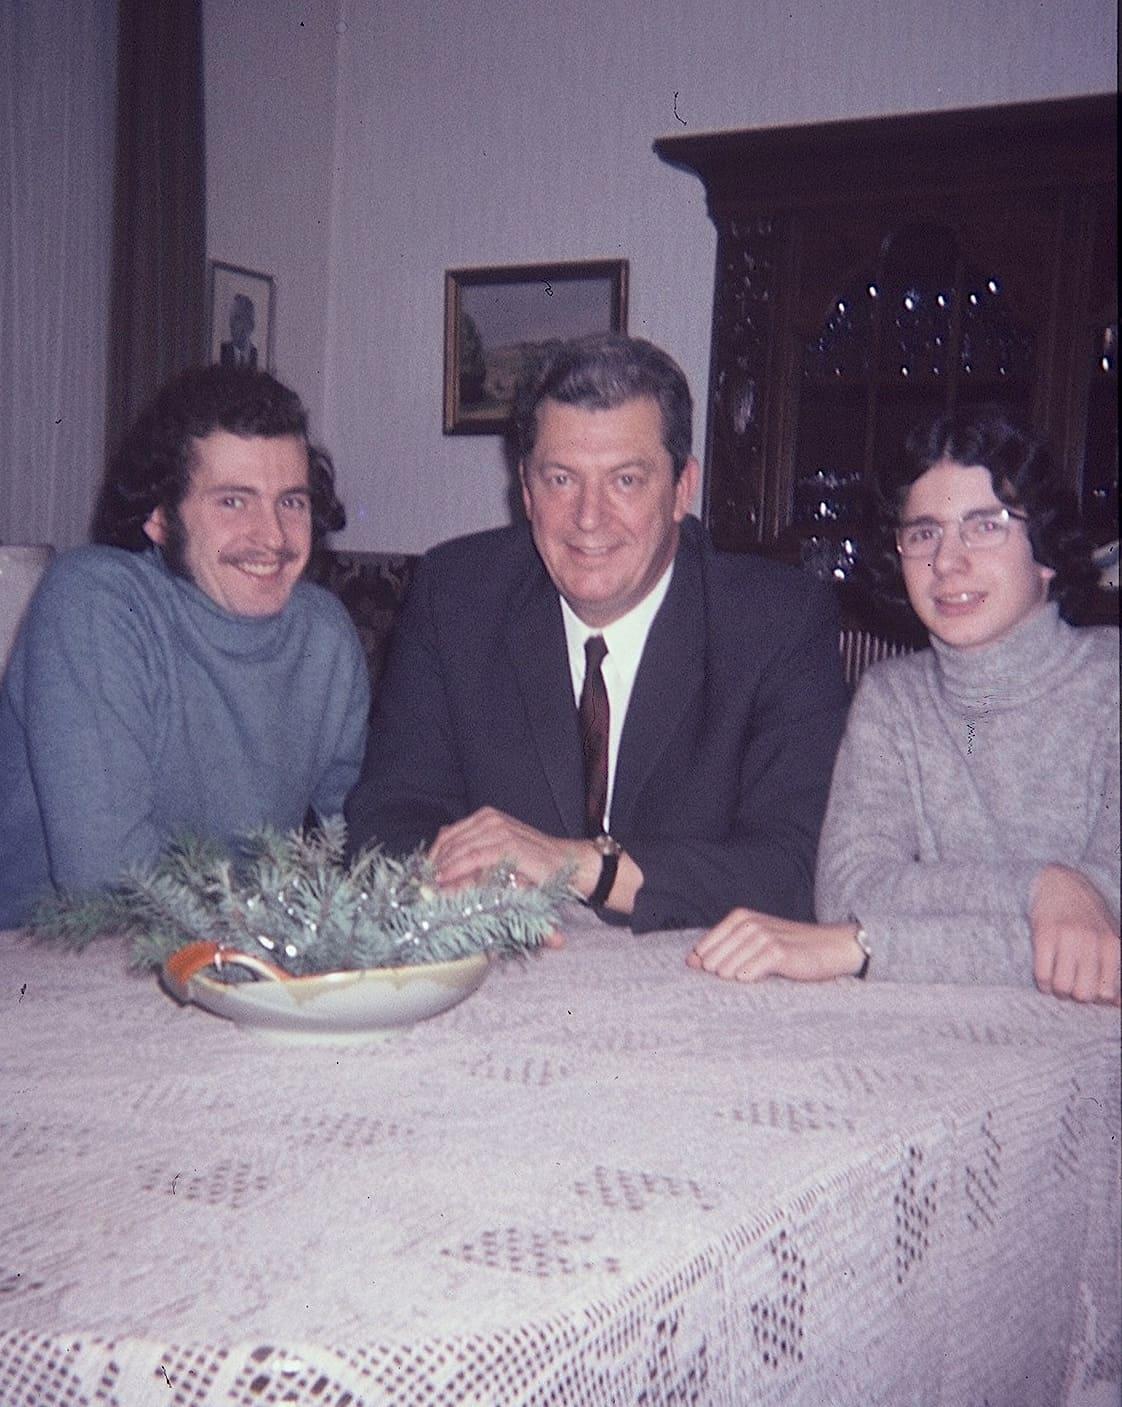 Michael, Werner & Thomas Wiegandt - 1970